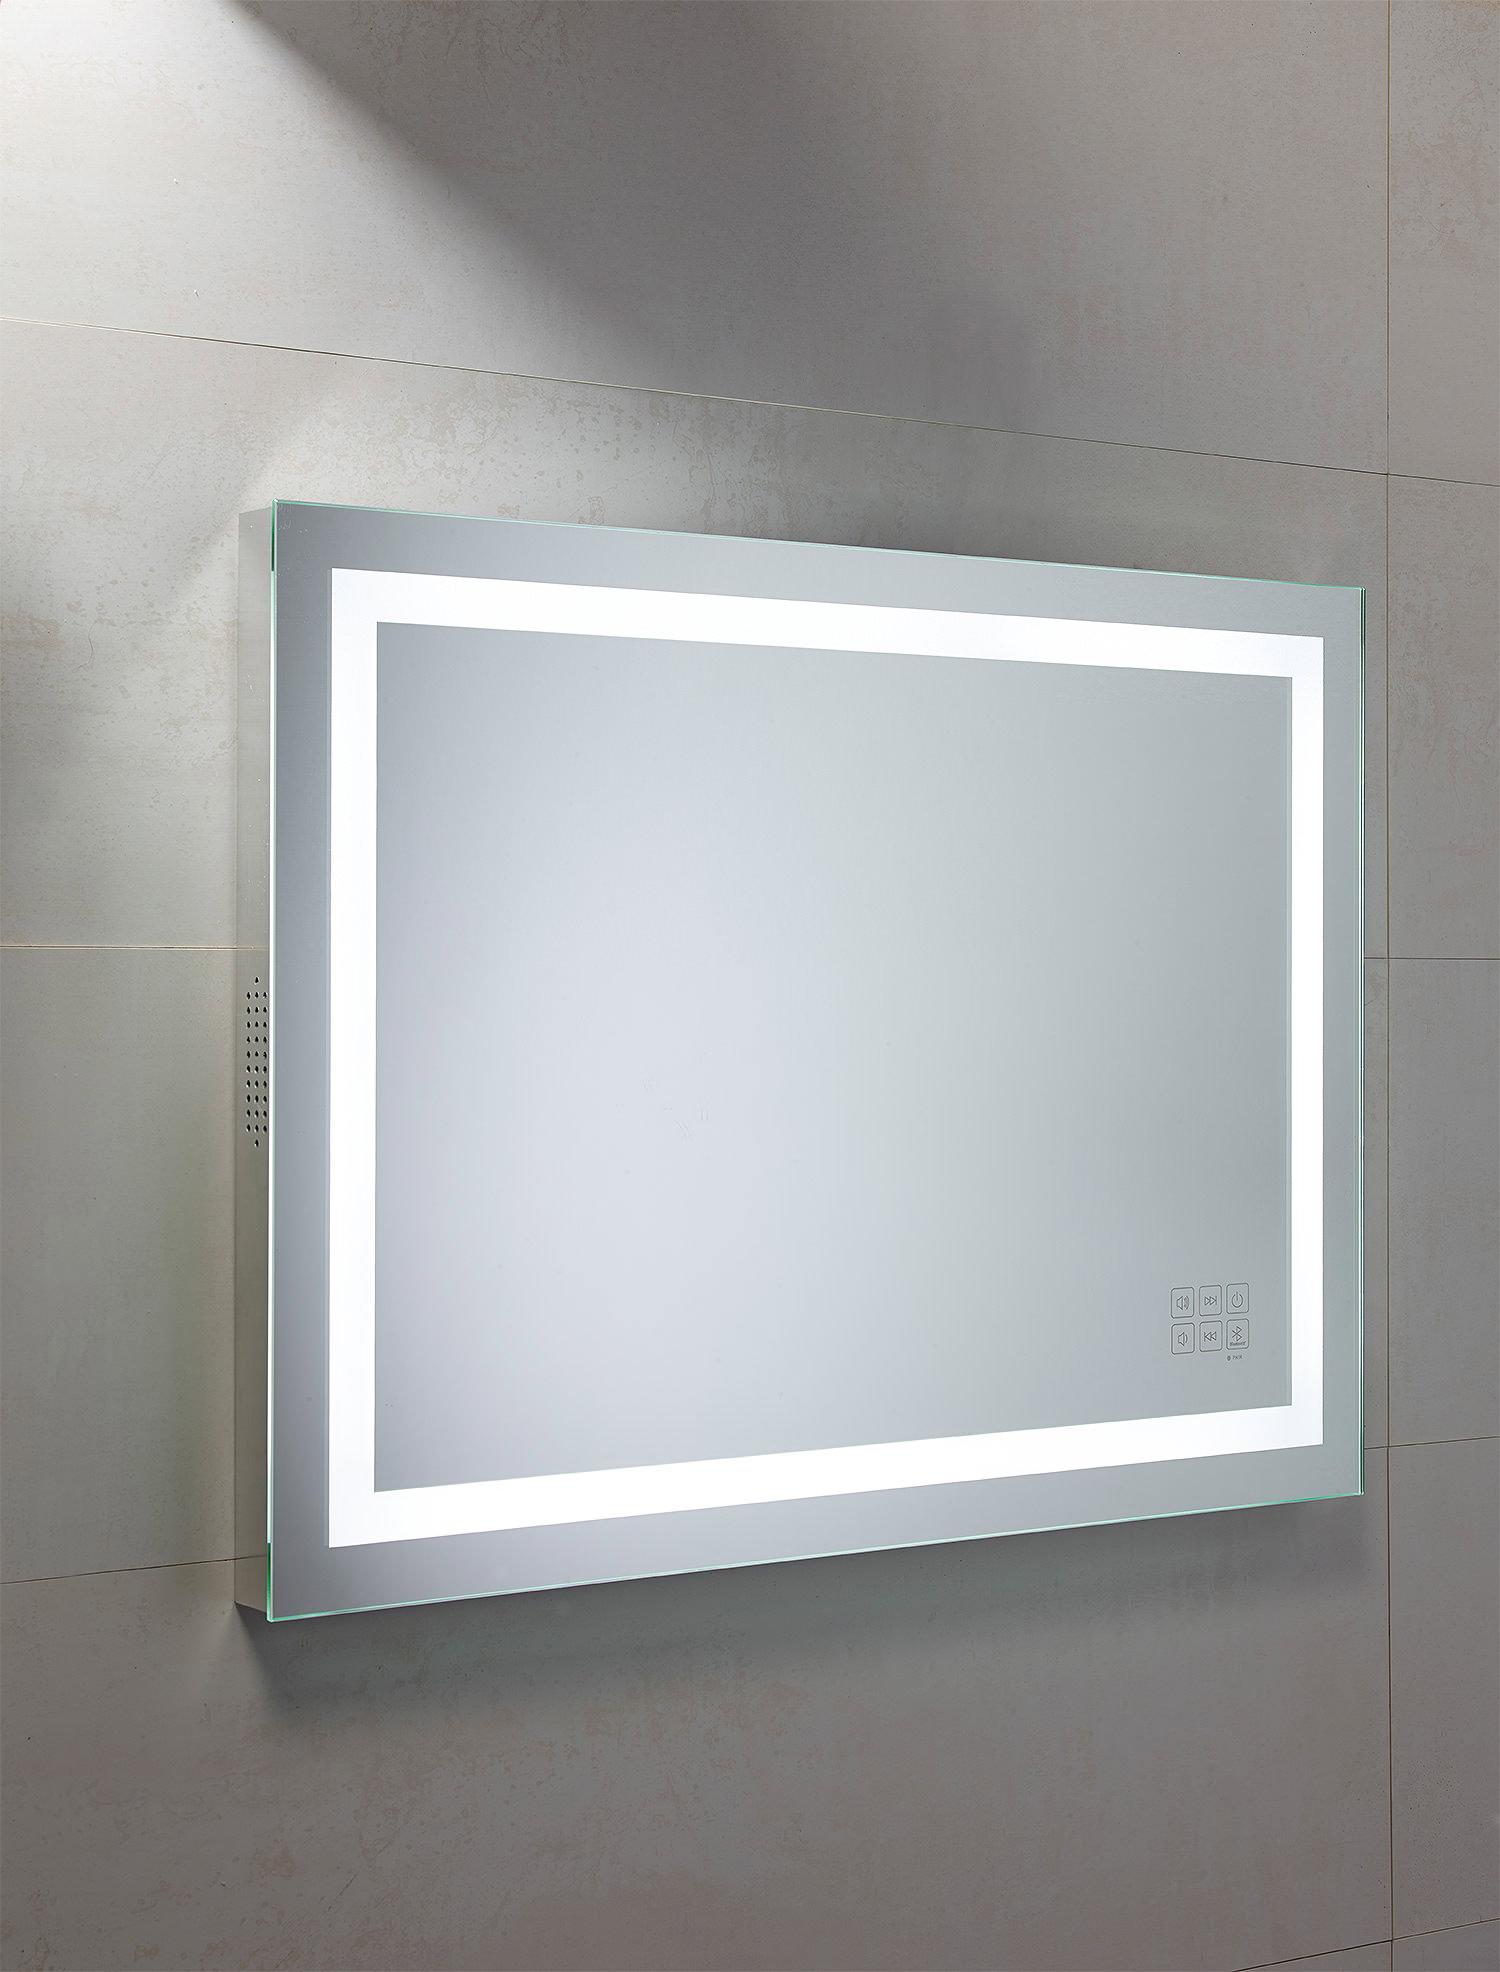 Flat Pack Kitchens >> Roper Rhodes Beat Bluetooth Mirror 800 x 600mm Chrome | MLE420